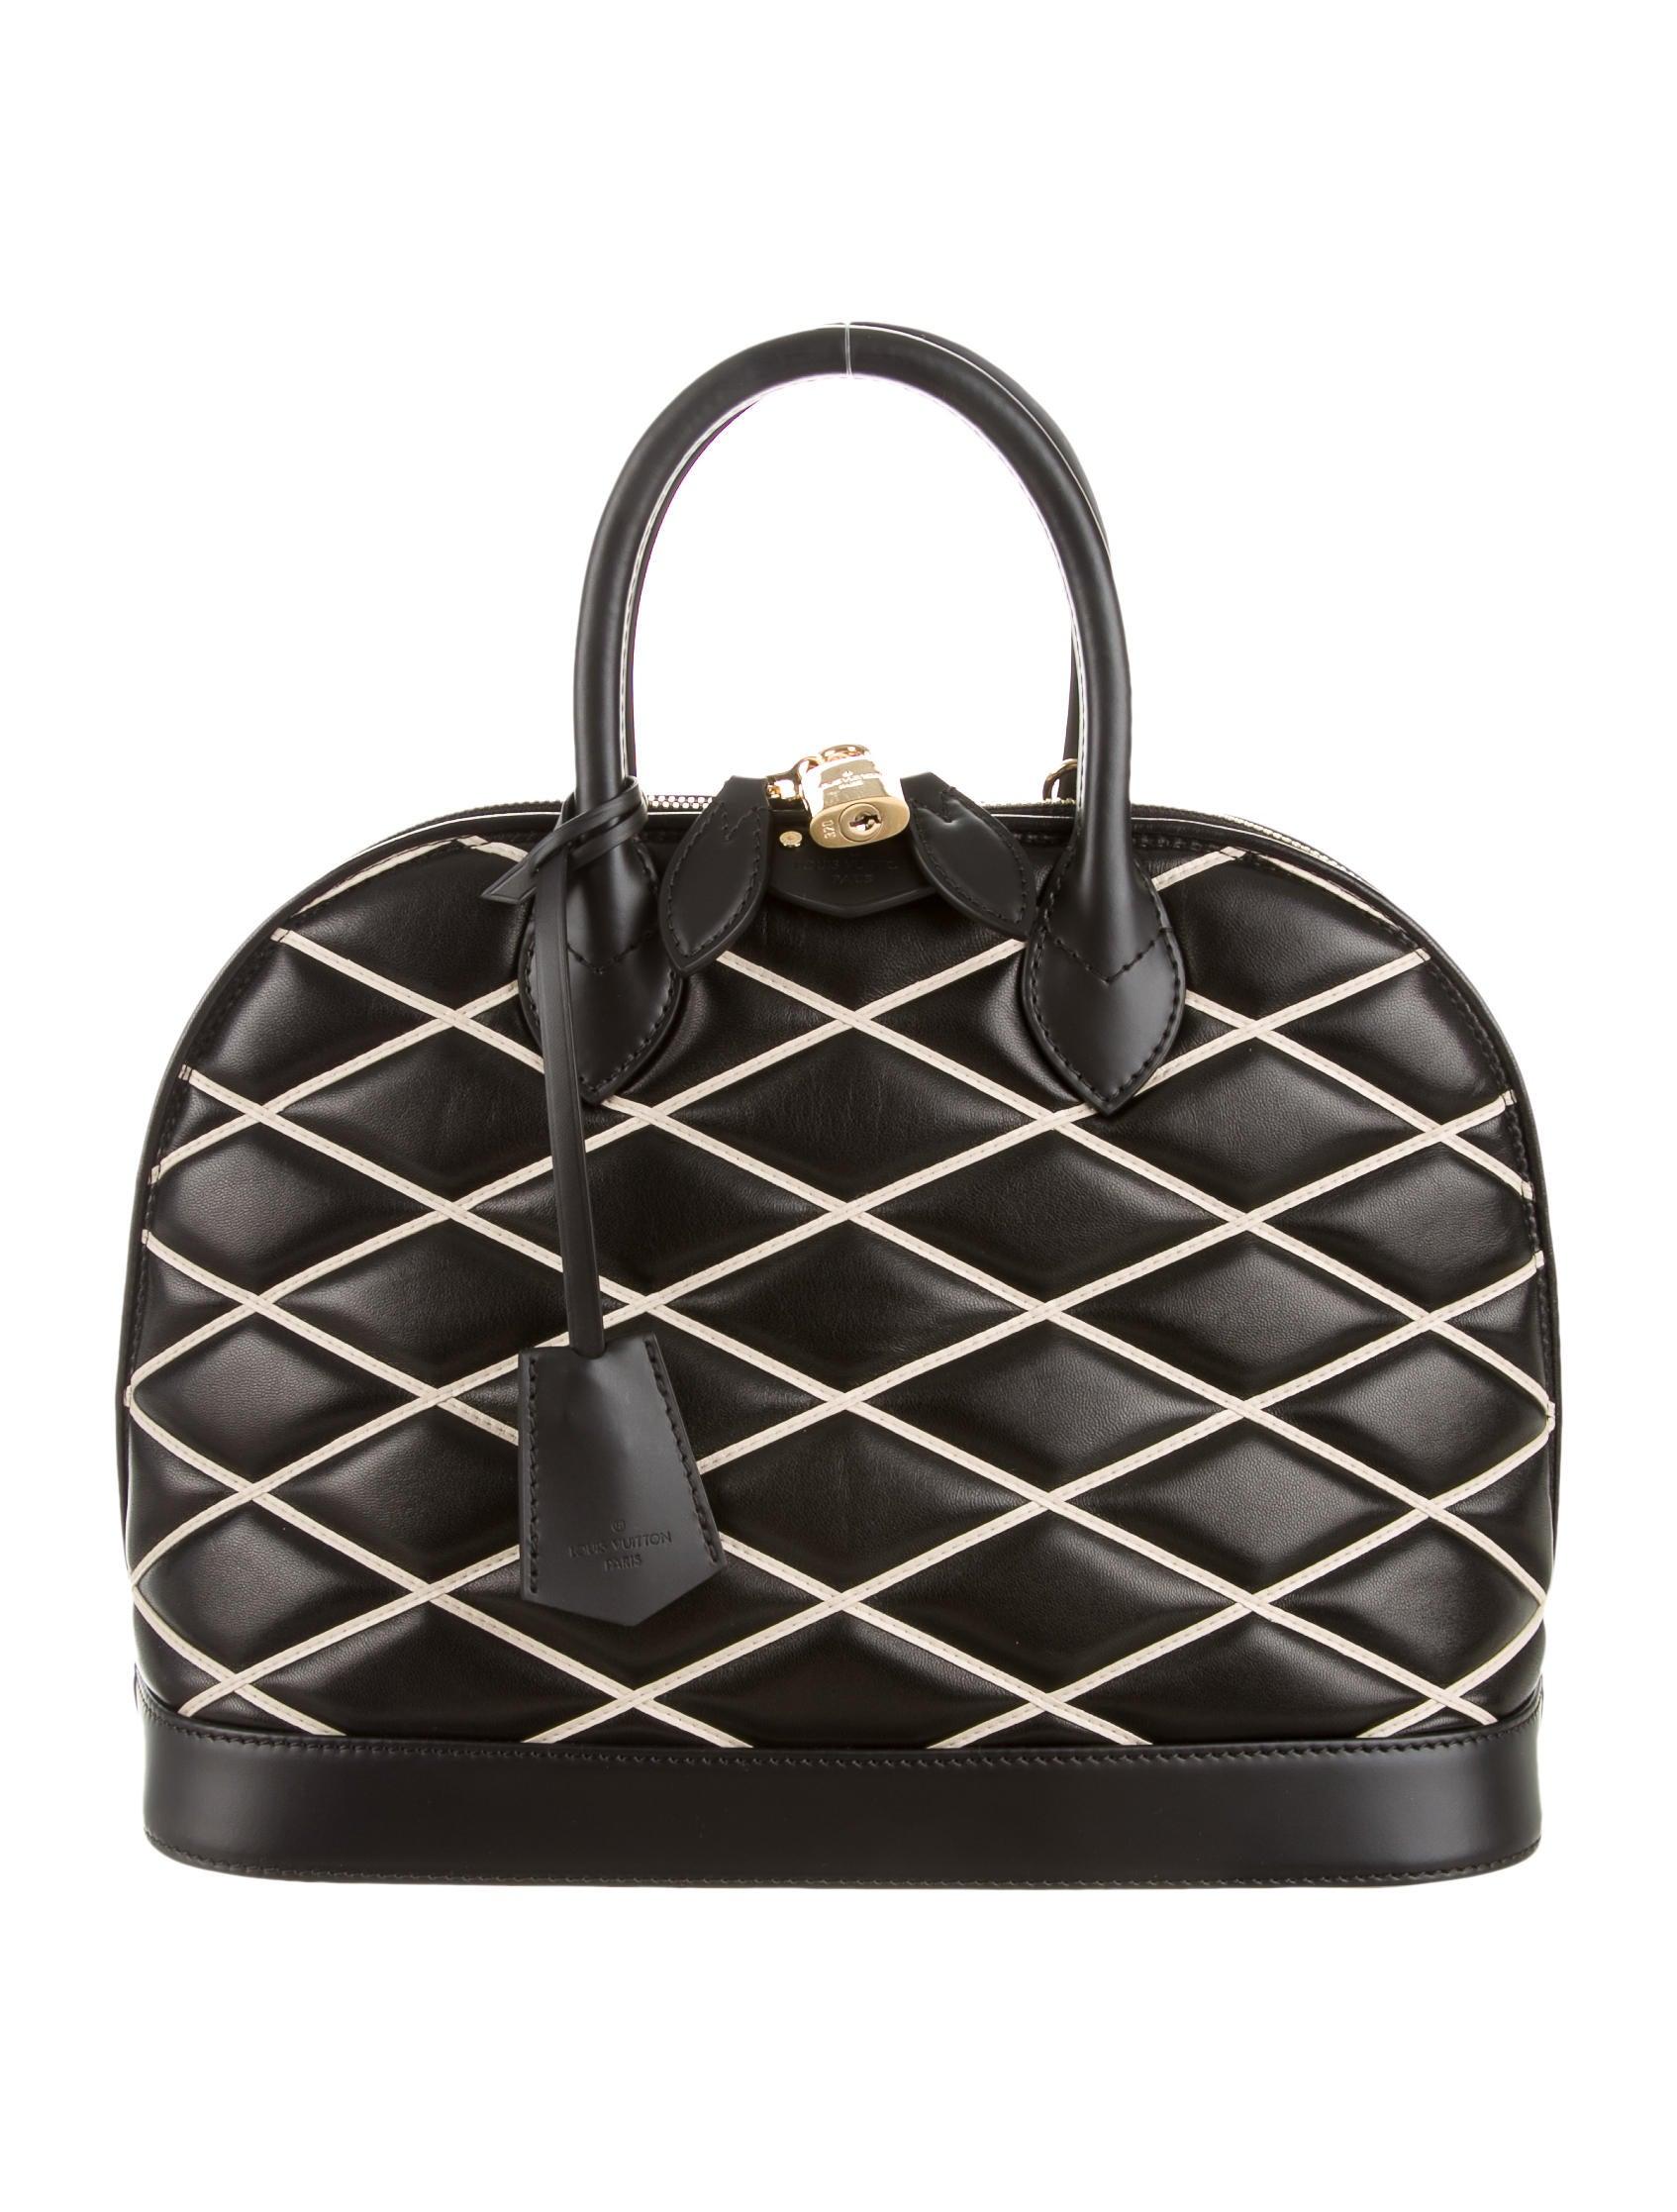 Louis Vuitton Alma Handbag Malletage Leather Pm JaAsPQ6s